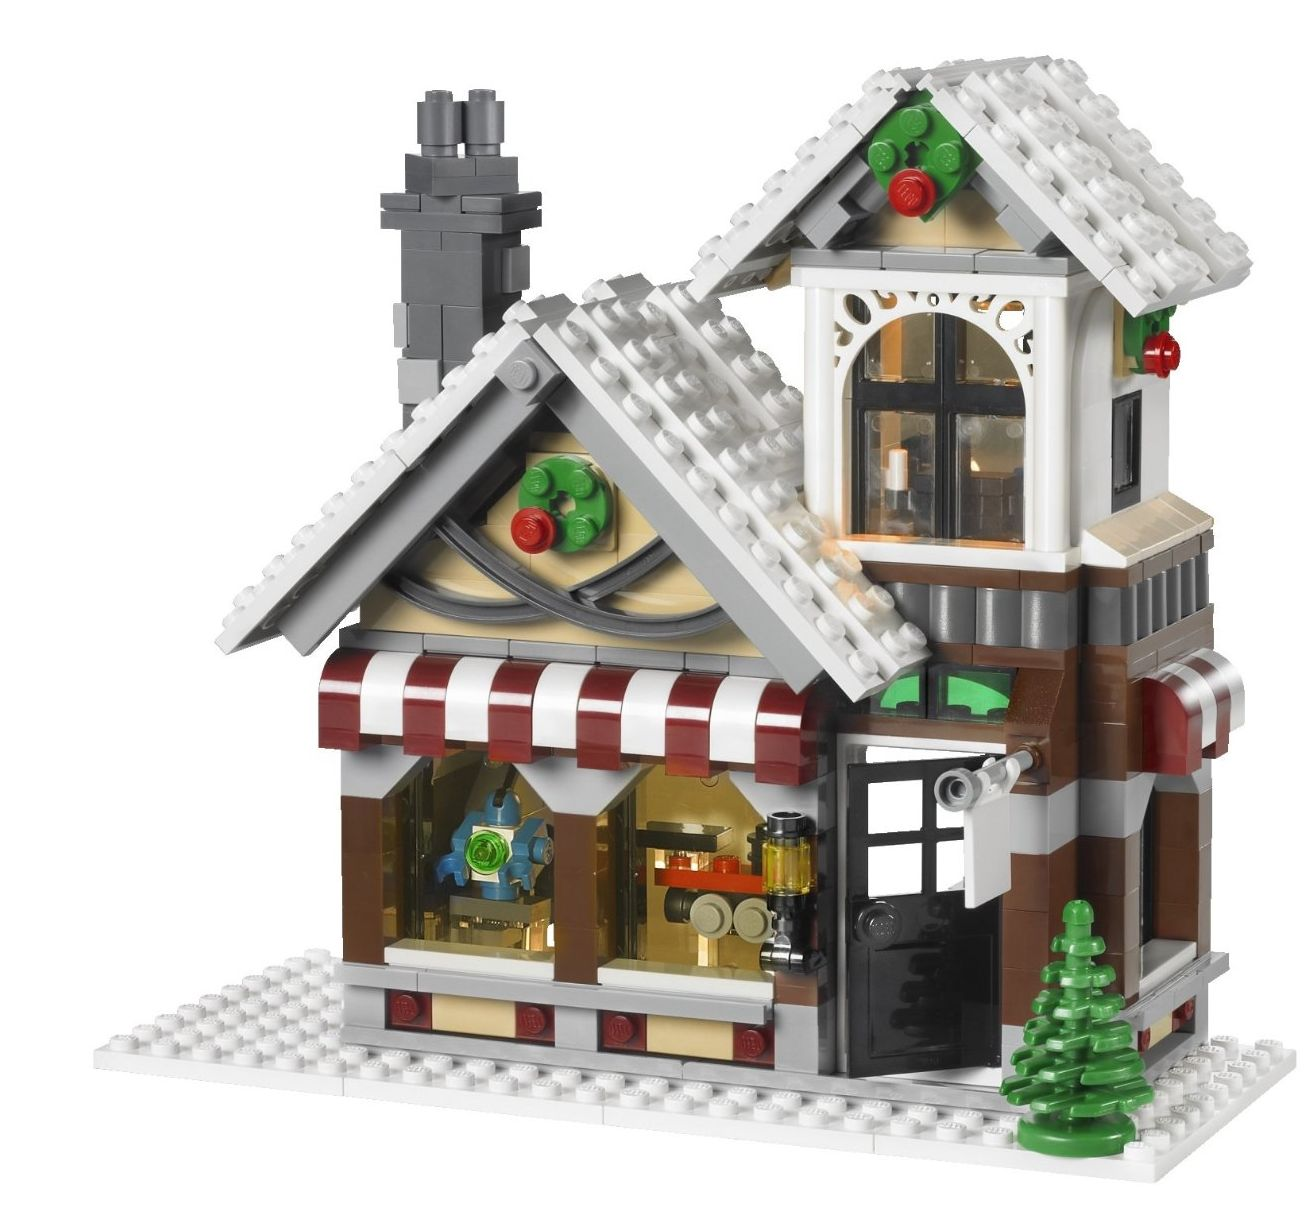 Toy Christmas Village